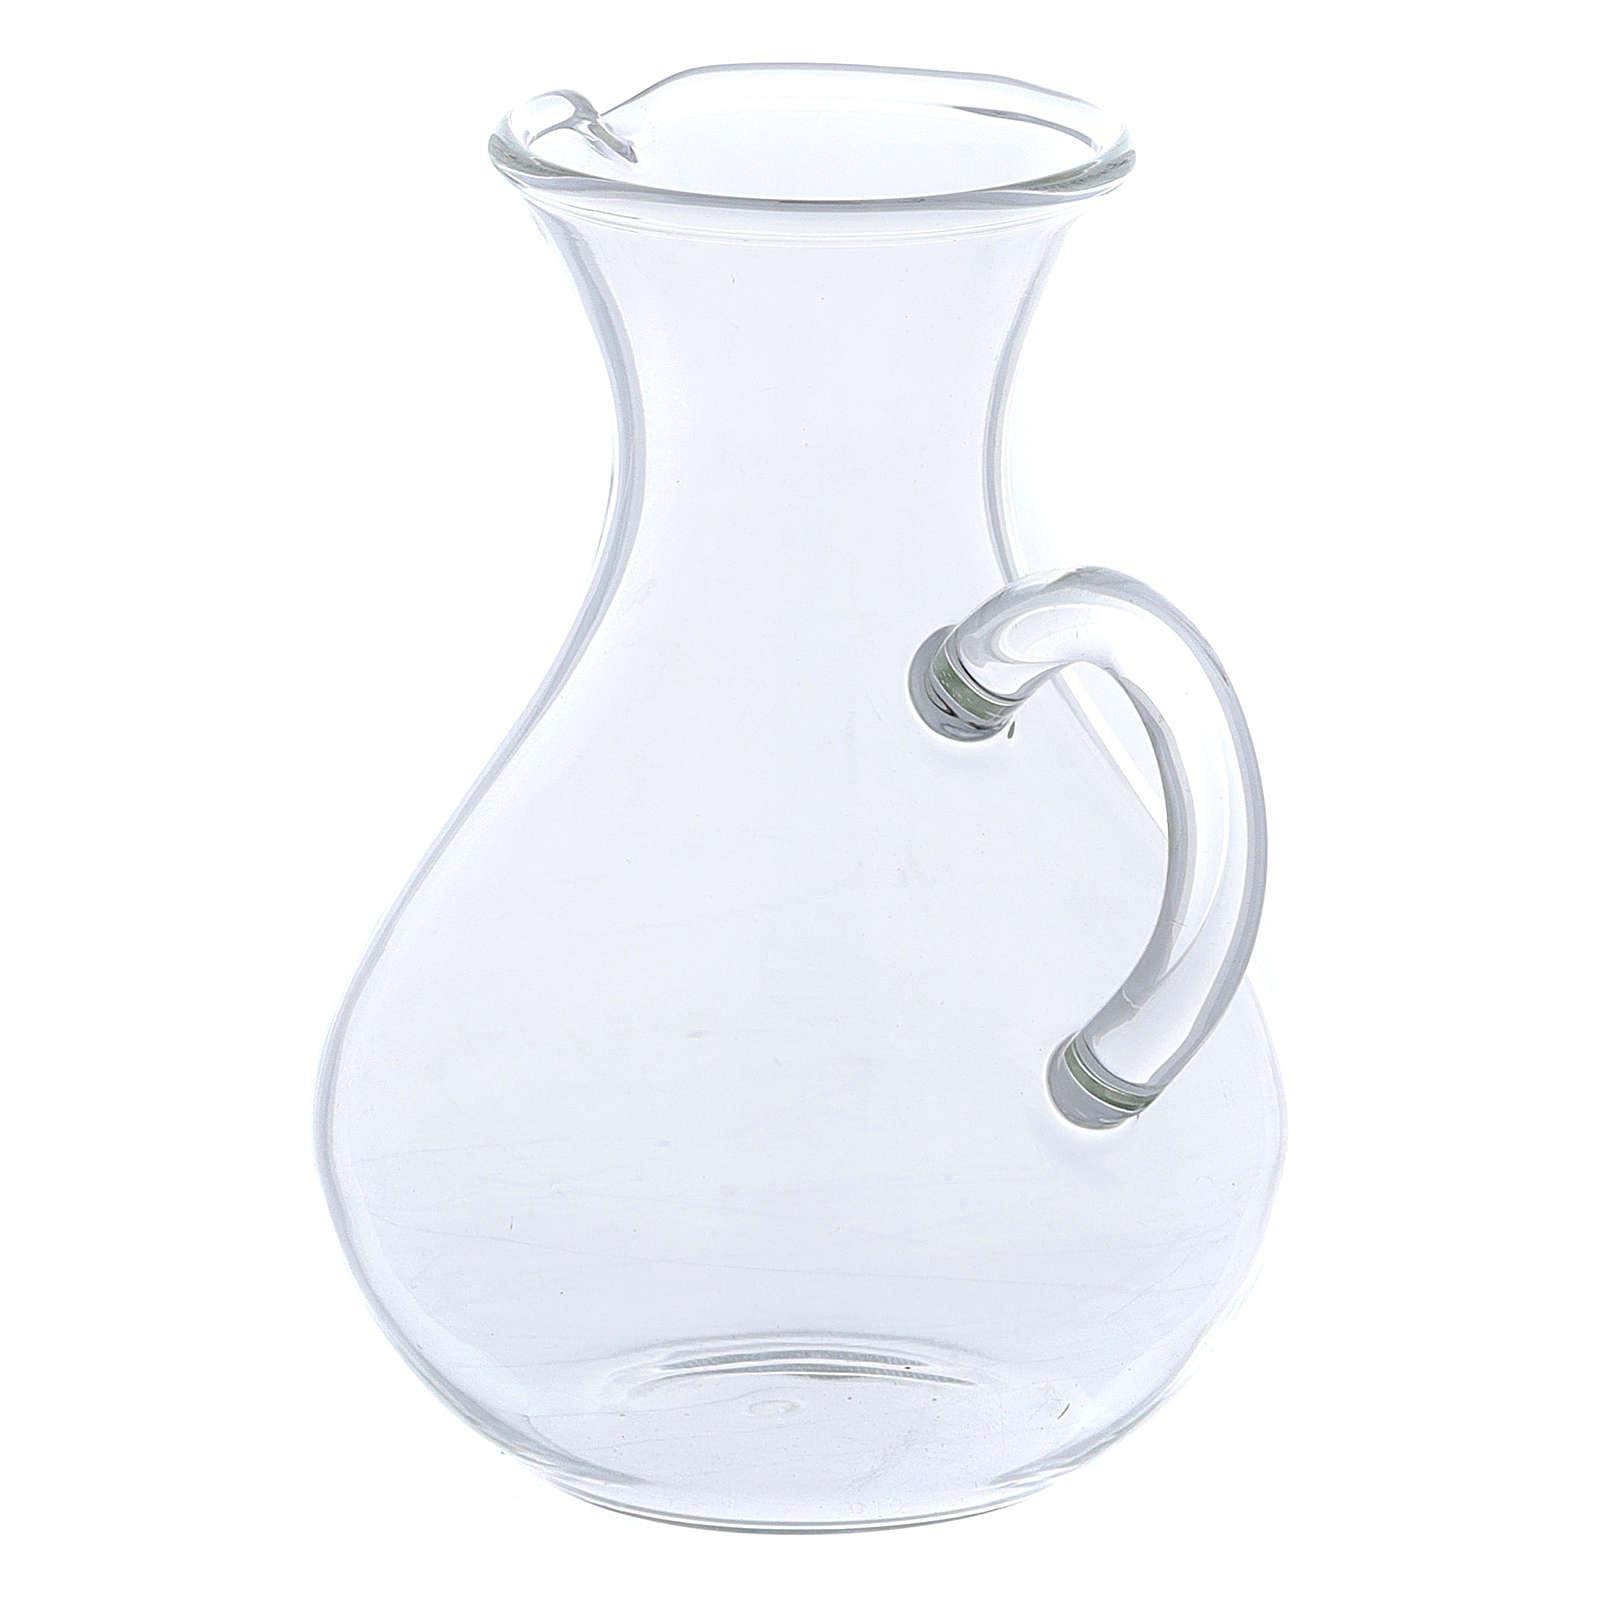 Jarritas vidrio modelo Roma panza ancha 130 ml 4